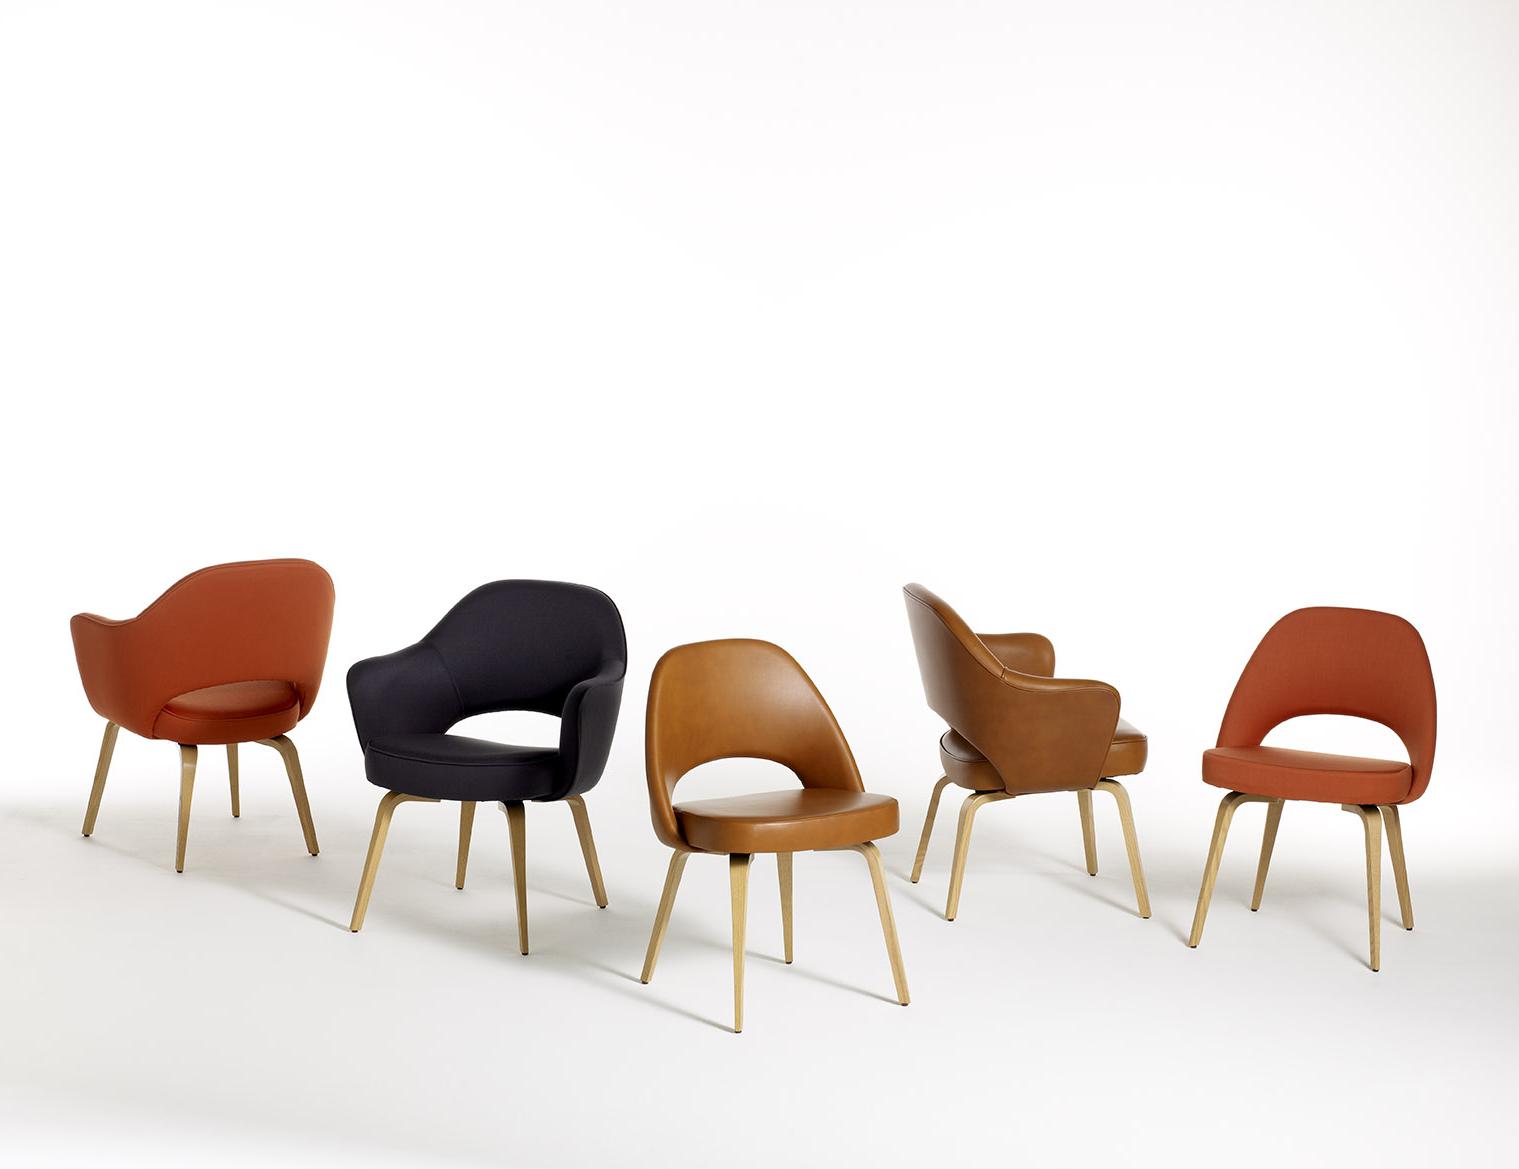 100 Tulip Chair Knoll Amazon Com Modway Lippa  : 11599c2C0 from 45.76.66.238 size 1519 x 1169 jpeg 345kB